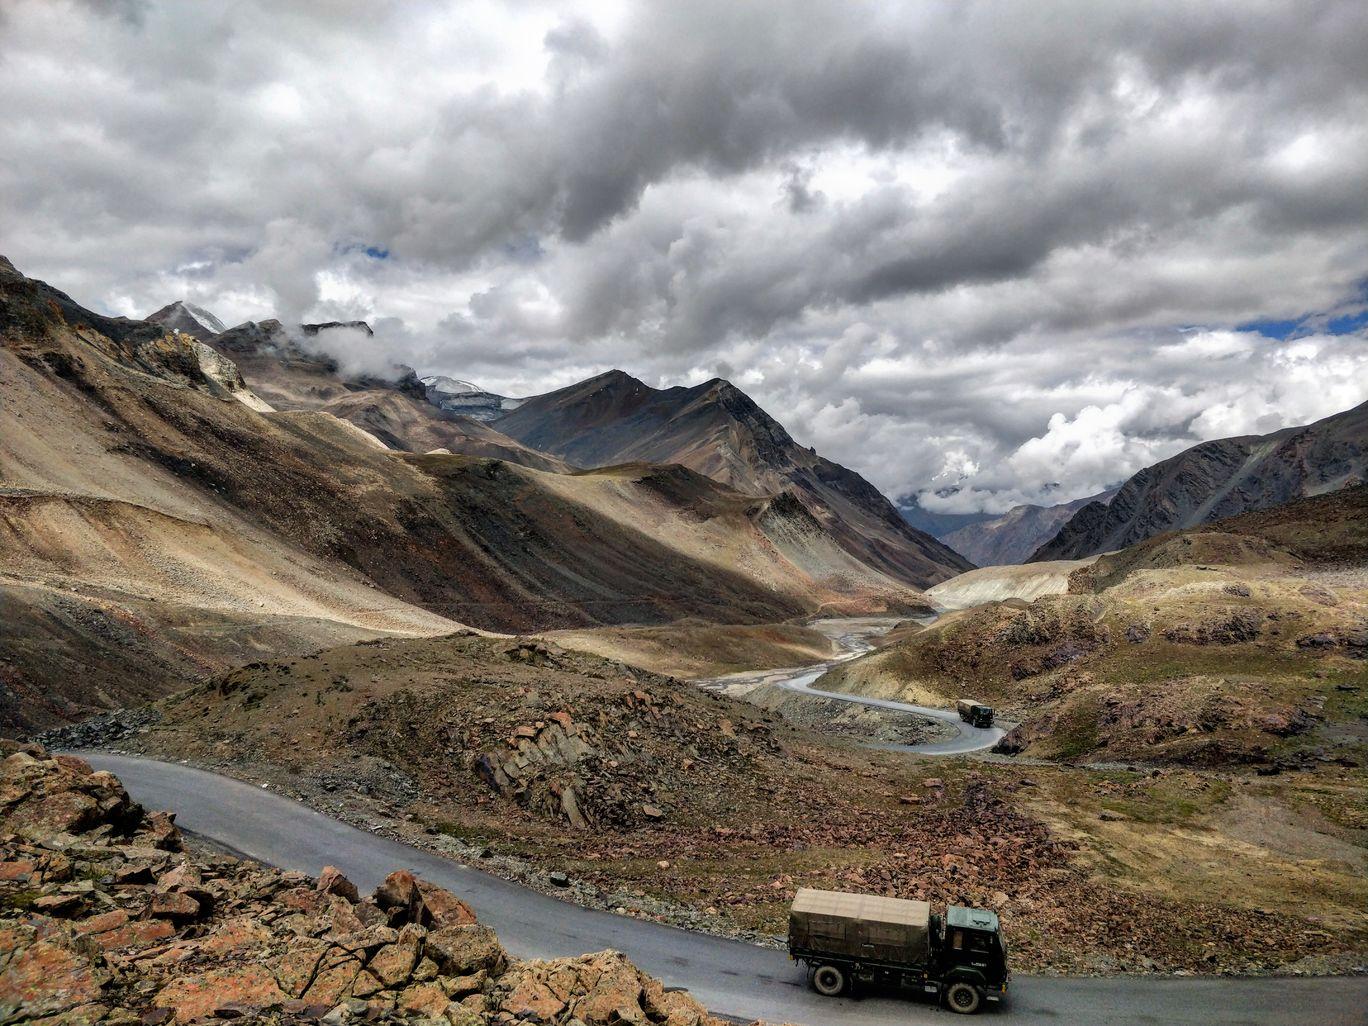 Photo of Baralacha La Pass By Gwyneth Pereira